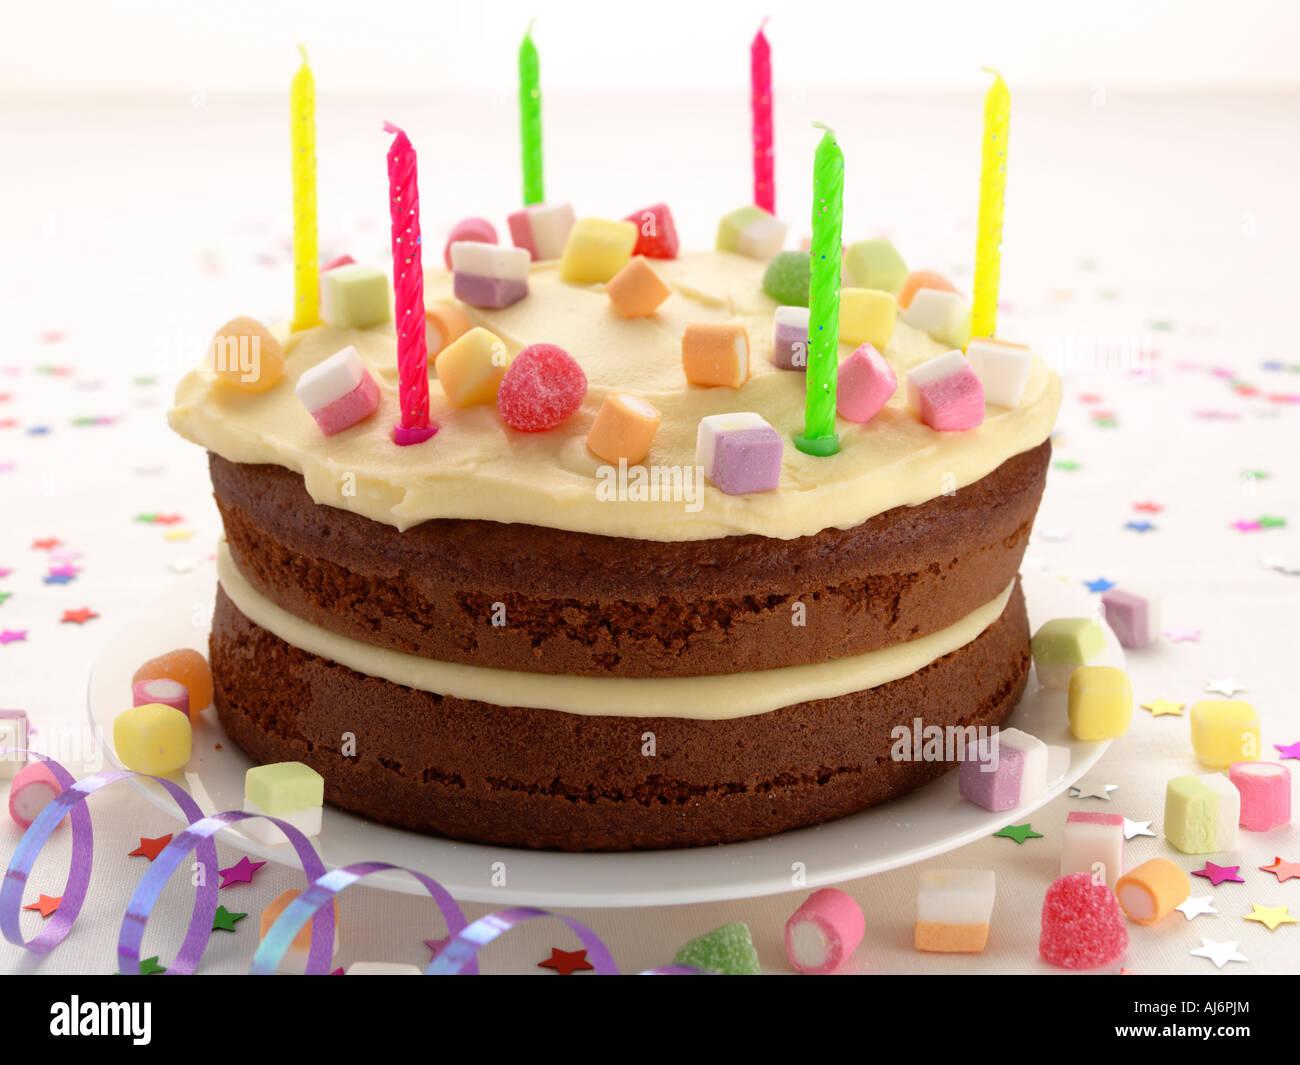 Kinder Geburtstagstorte mit Kerzen Stockfoto Bild 14640187  Alamy